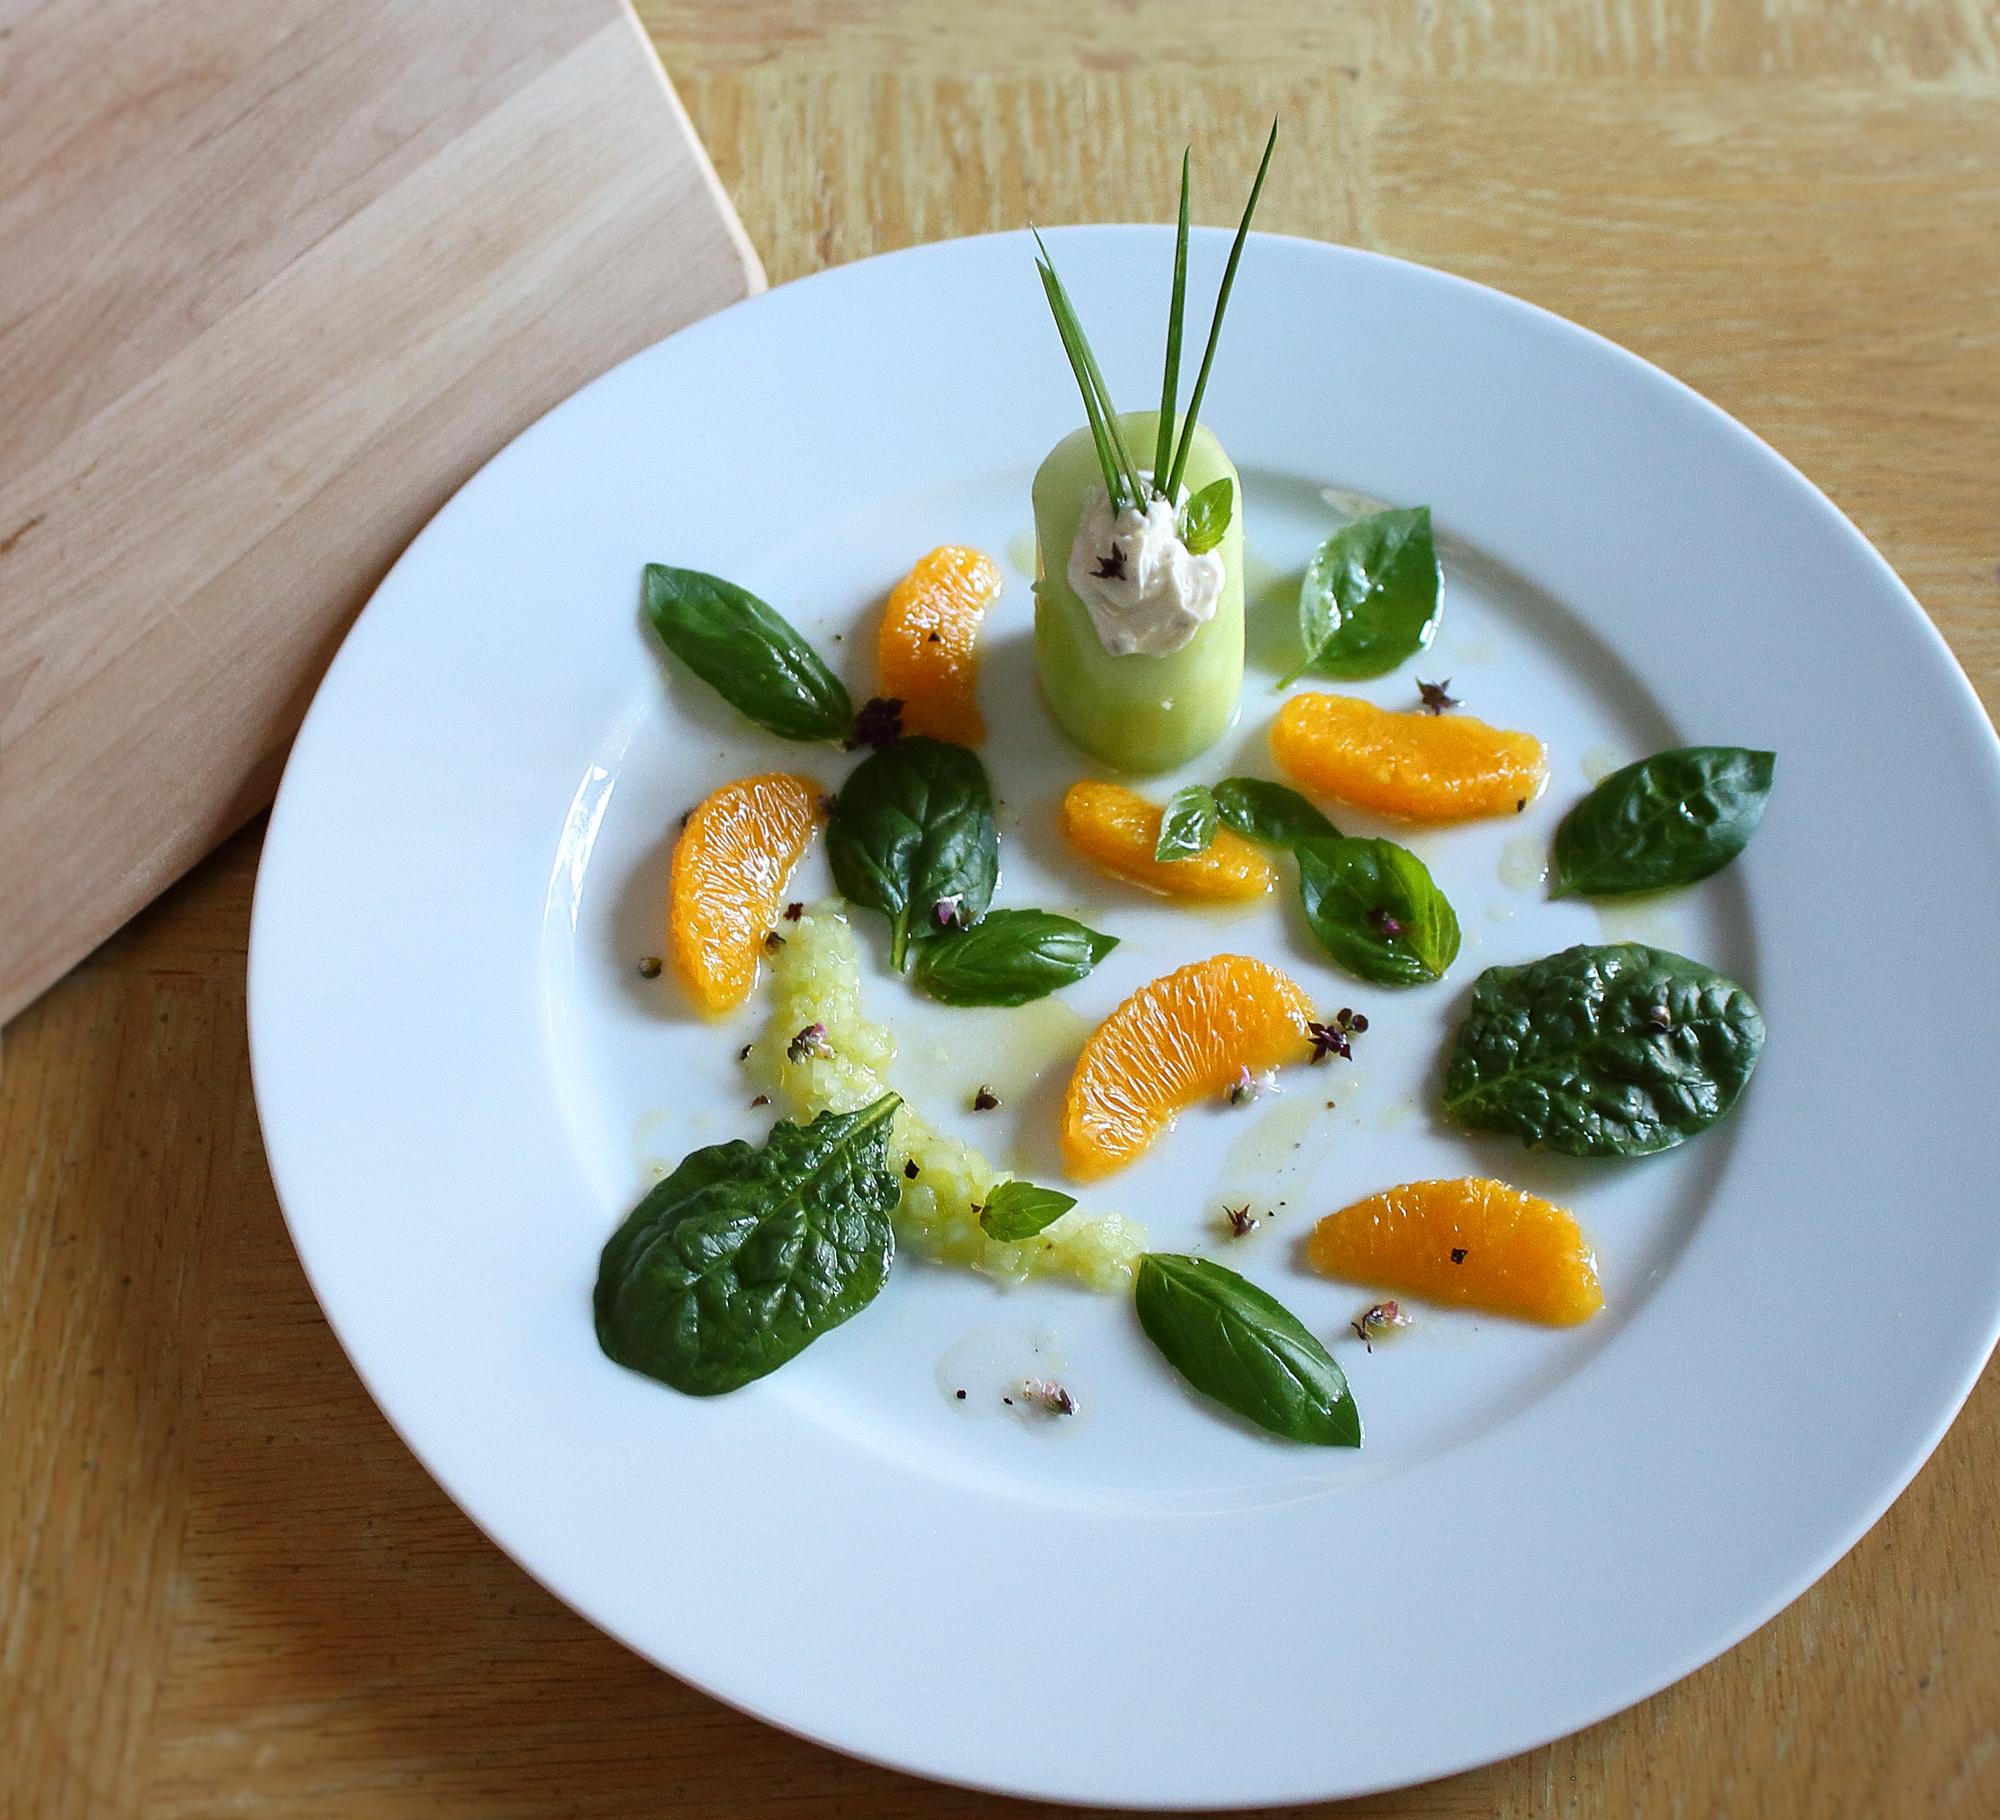 Cucumber Orange and Spinach Salad